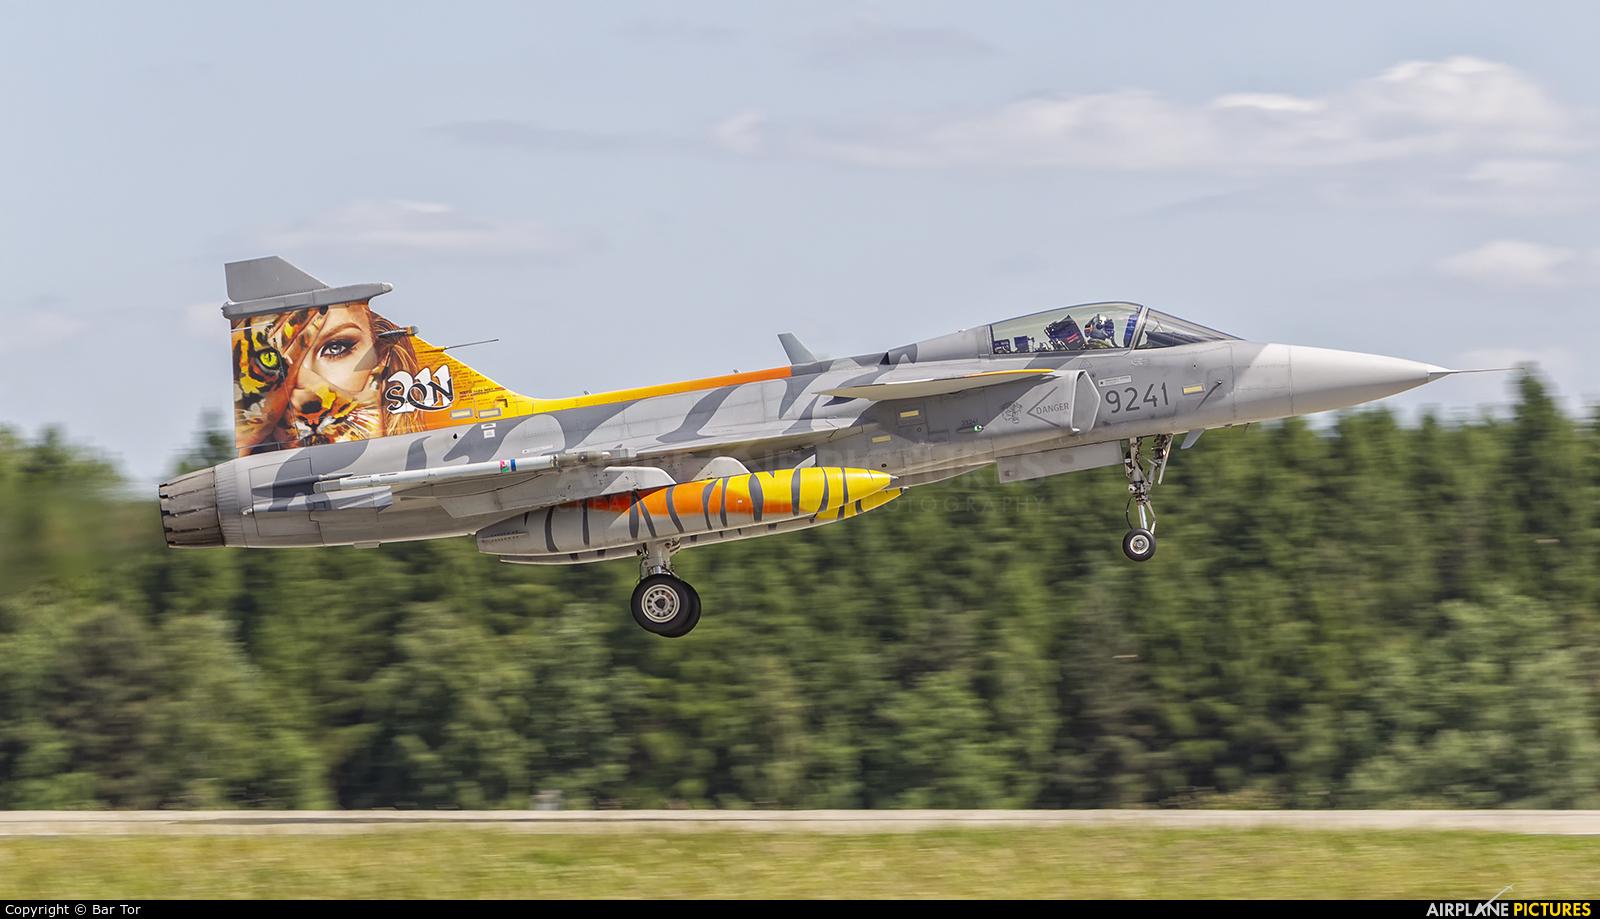 Czech - Air Force 9241 aircraft at Poznań - Krzesiny